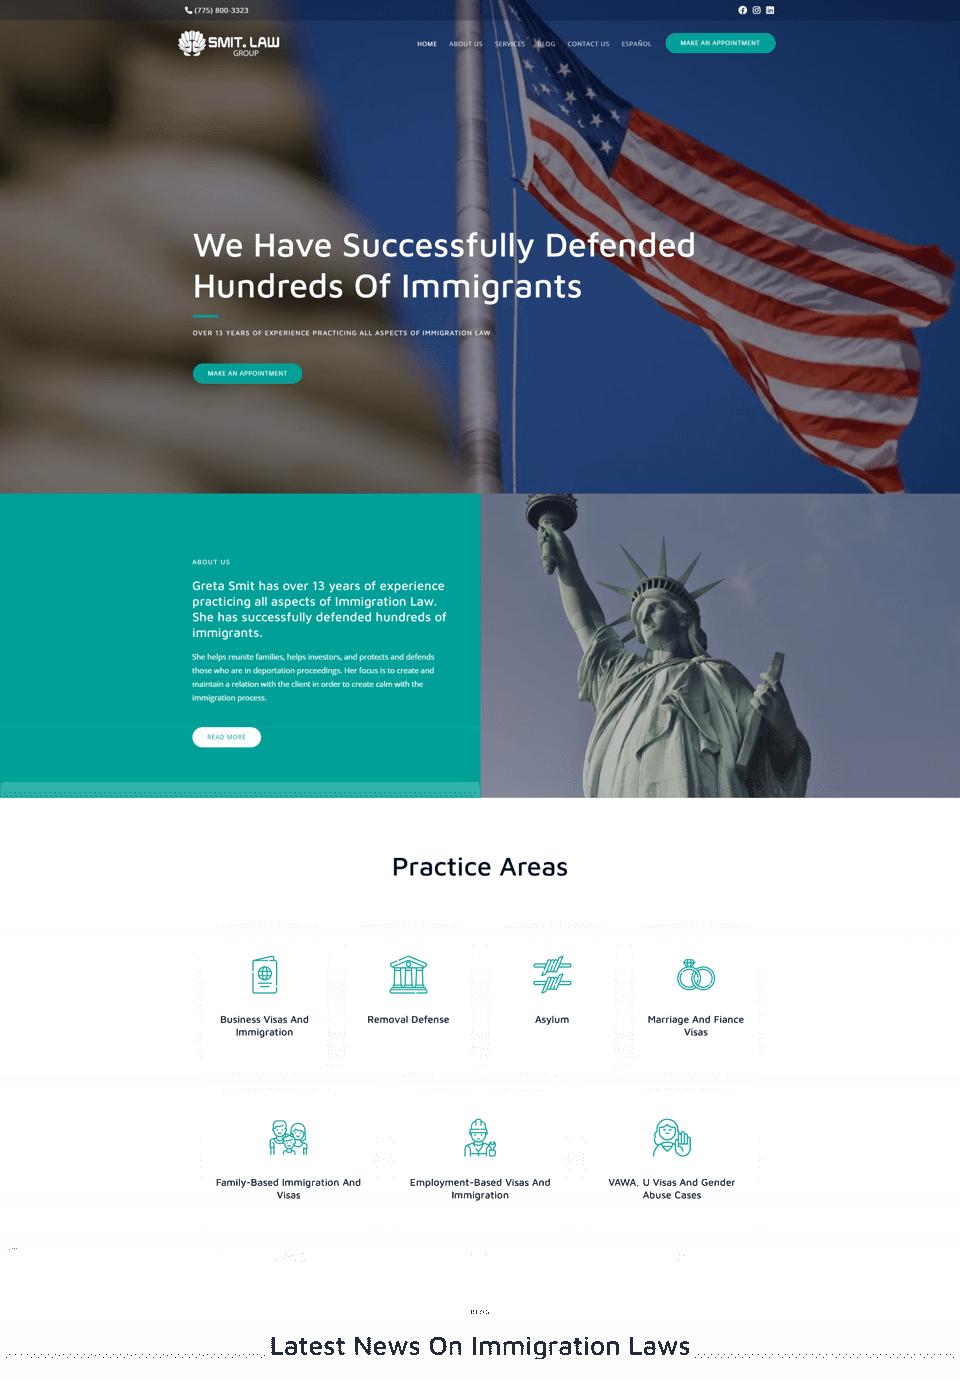 Web development for lawyers Smit.Law Group